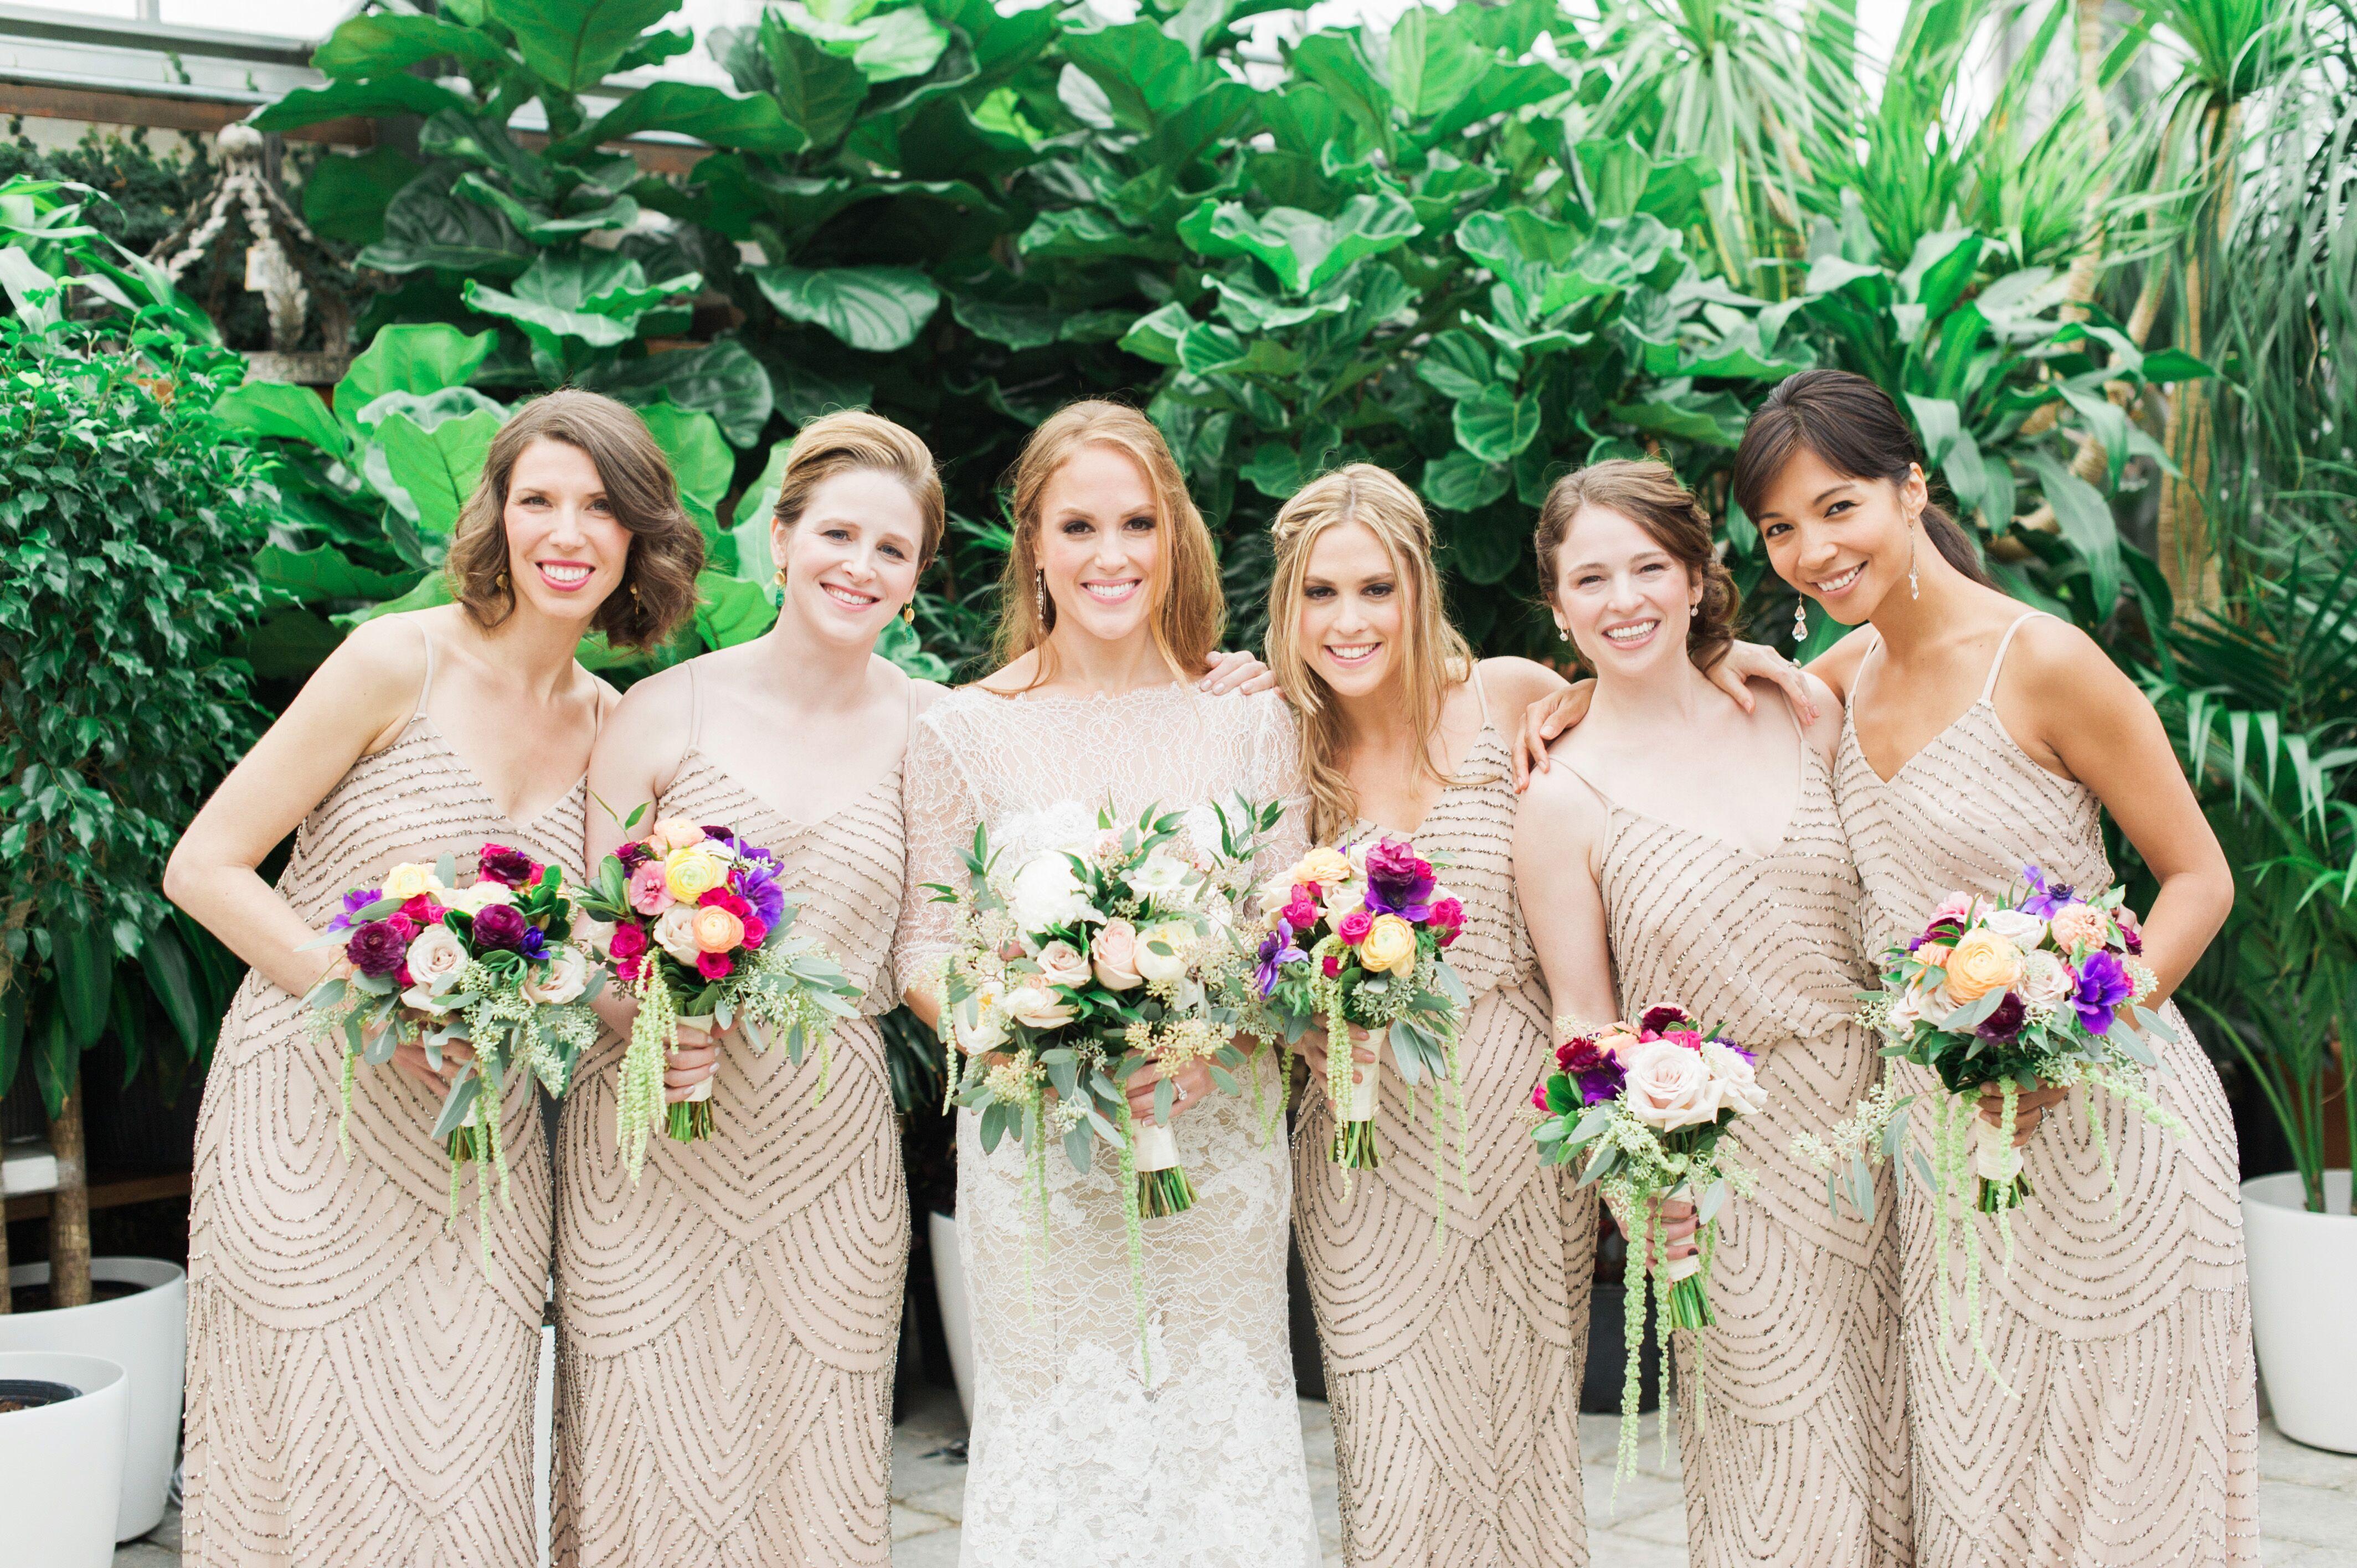 Adrianna papell bridesmaid dressbridesmaid dressesdressesss adrianna papell bridesmaid dress ombrellifo Choice Image